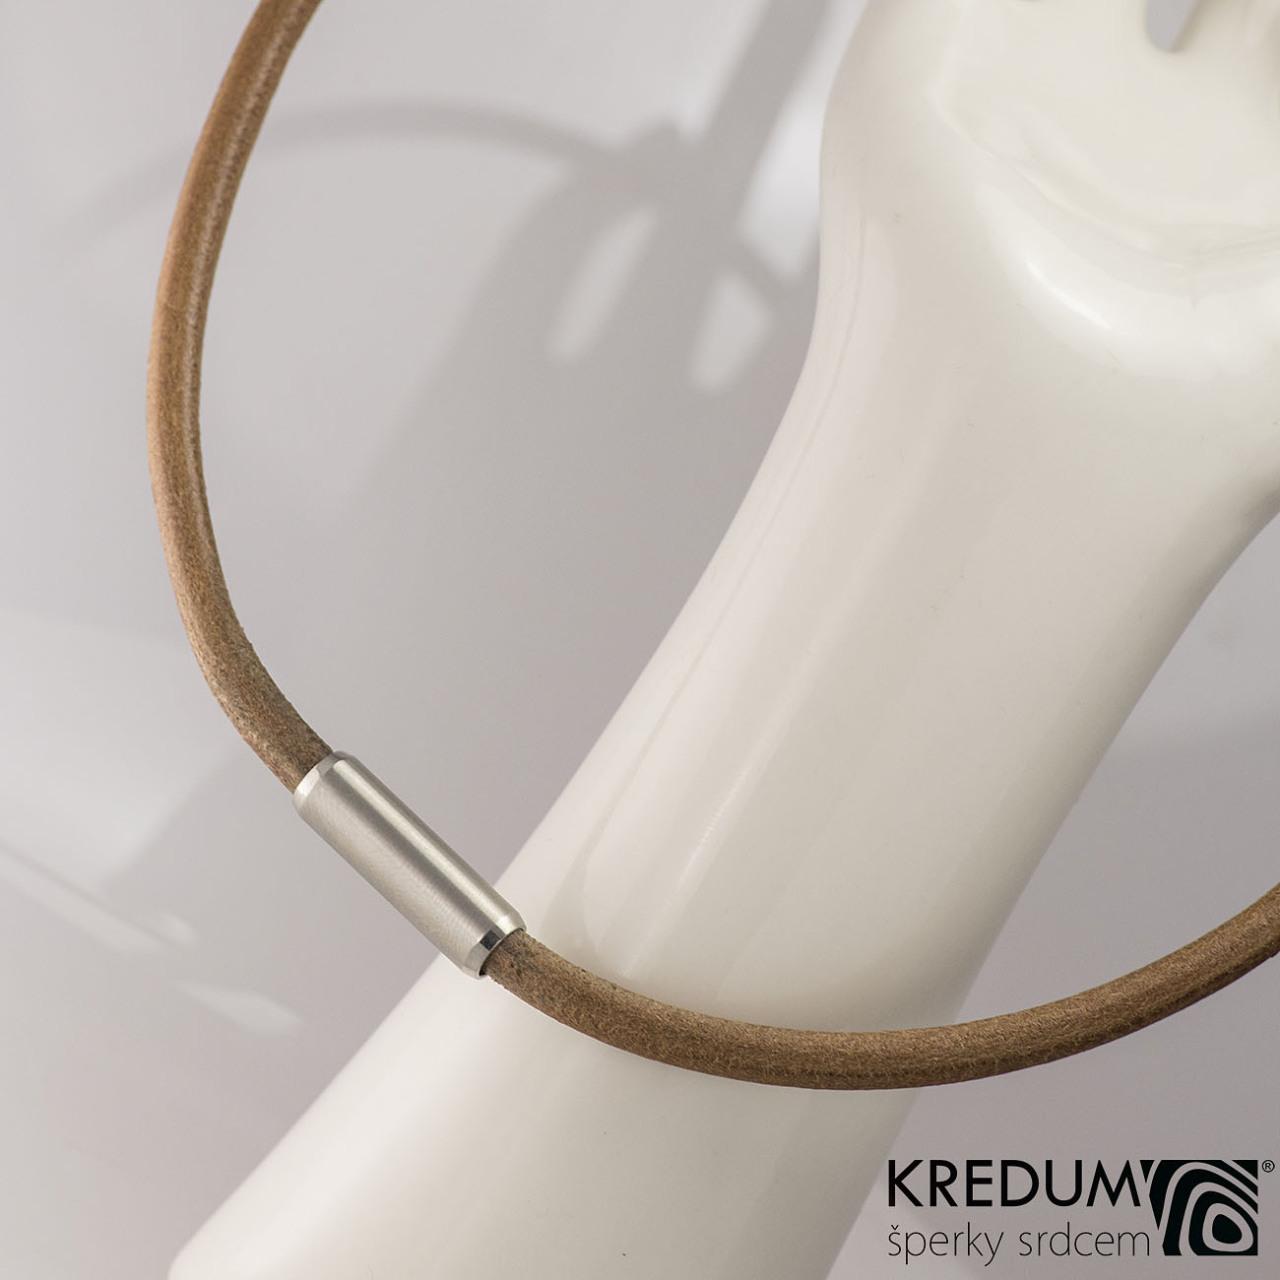 Kožený náhrdelník - Samuel hnědý - jemný mat - Výroba hand made ... fbe6b06188b